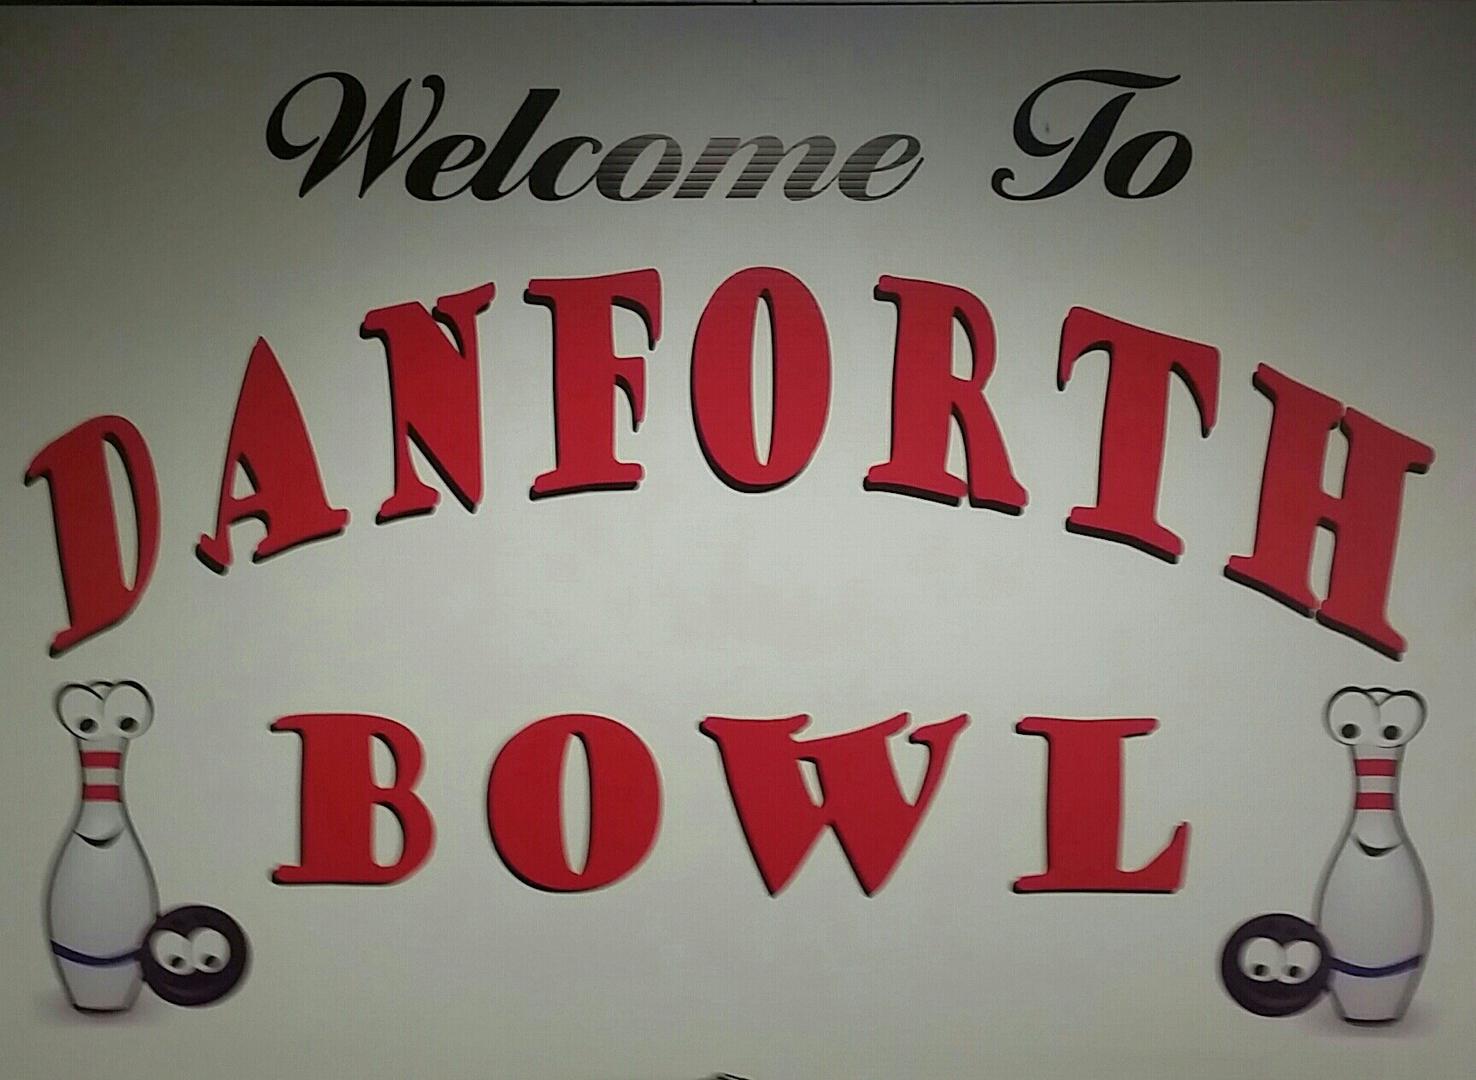 Home | Danforth Bowl | Toronto, Ontario